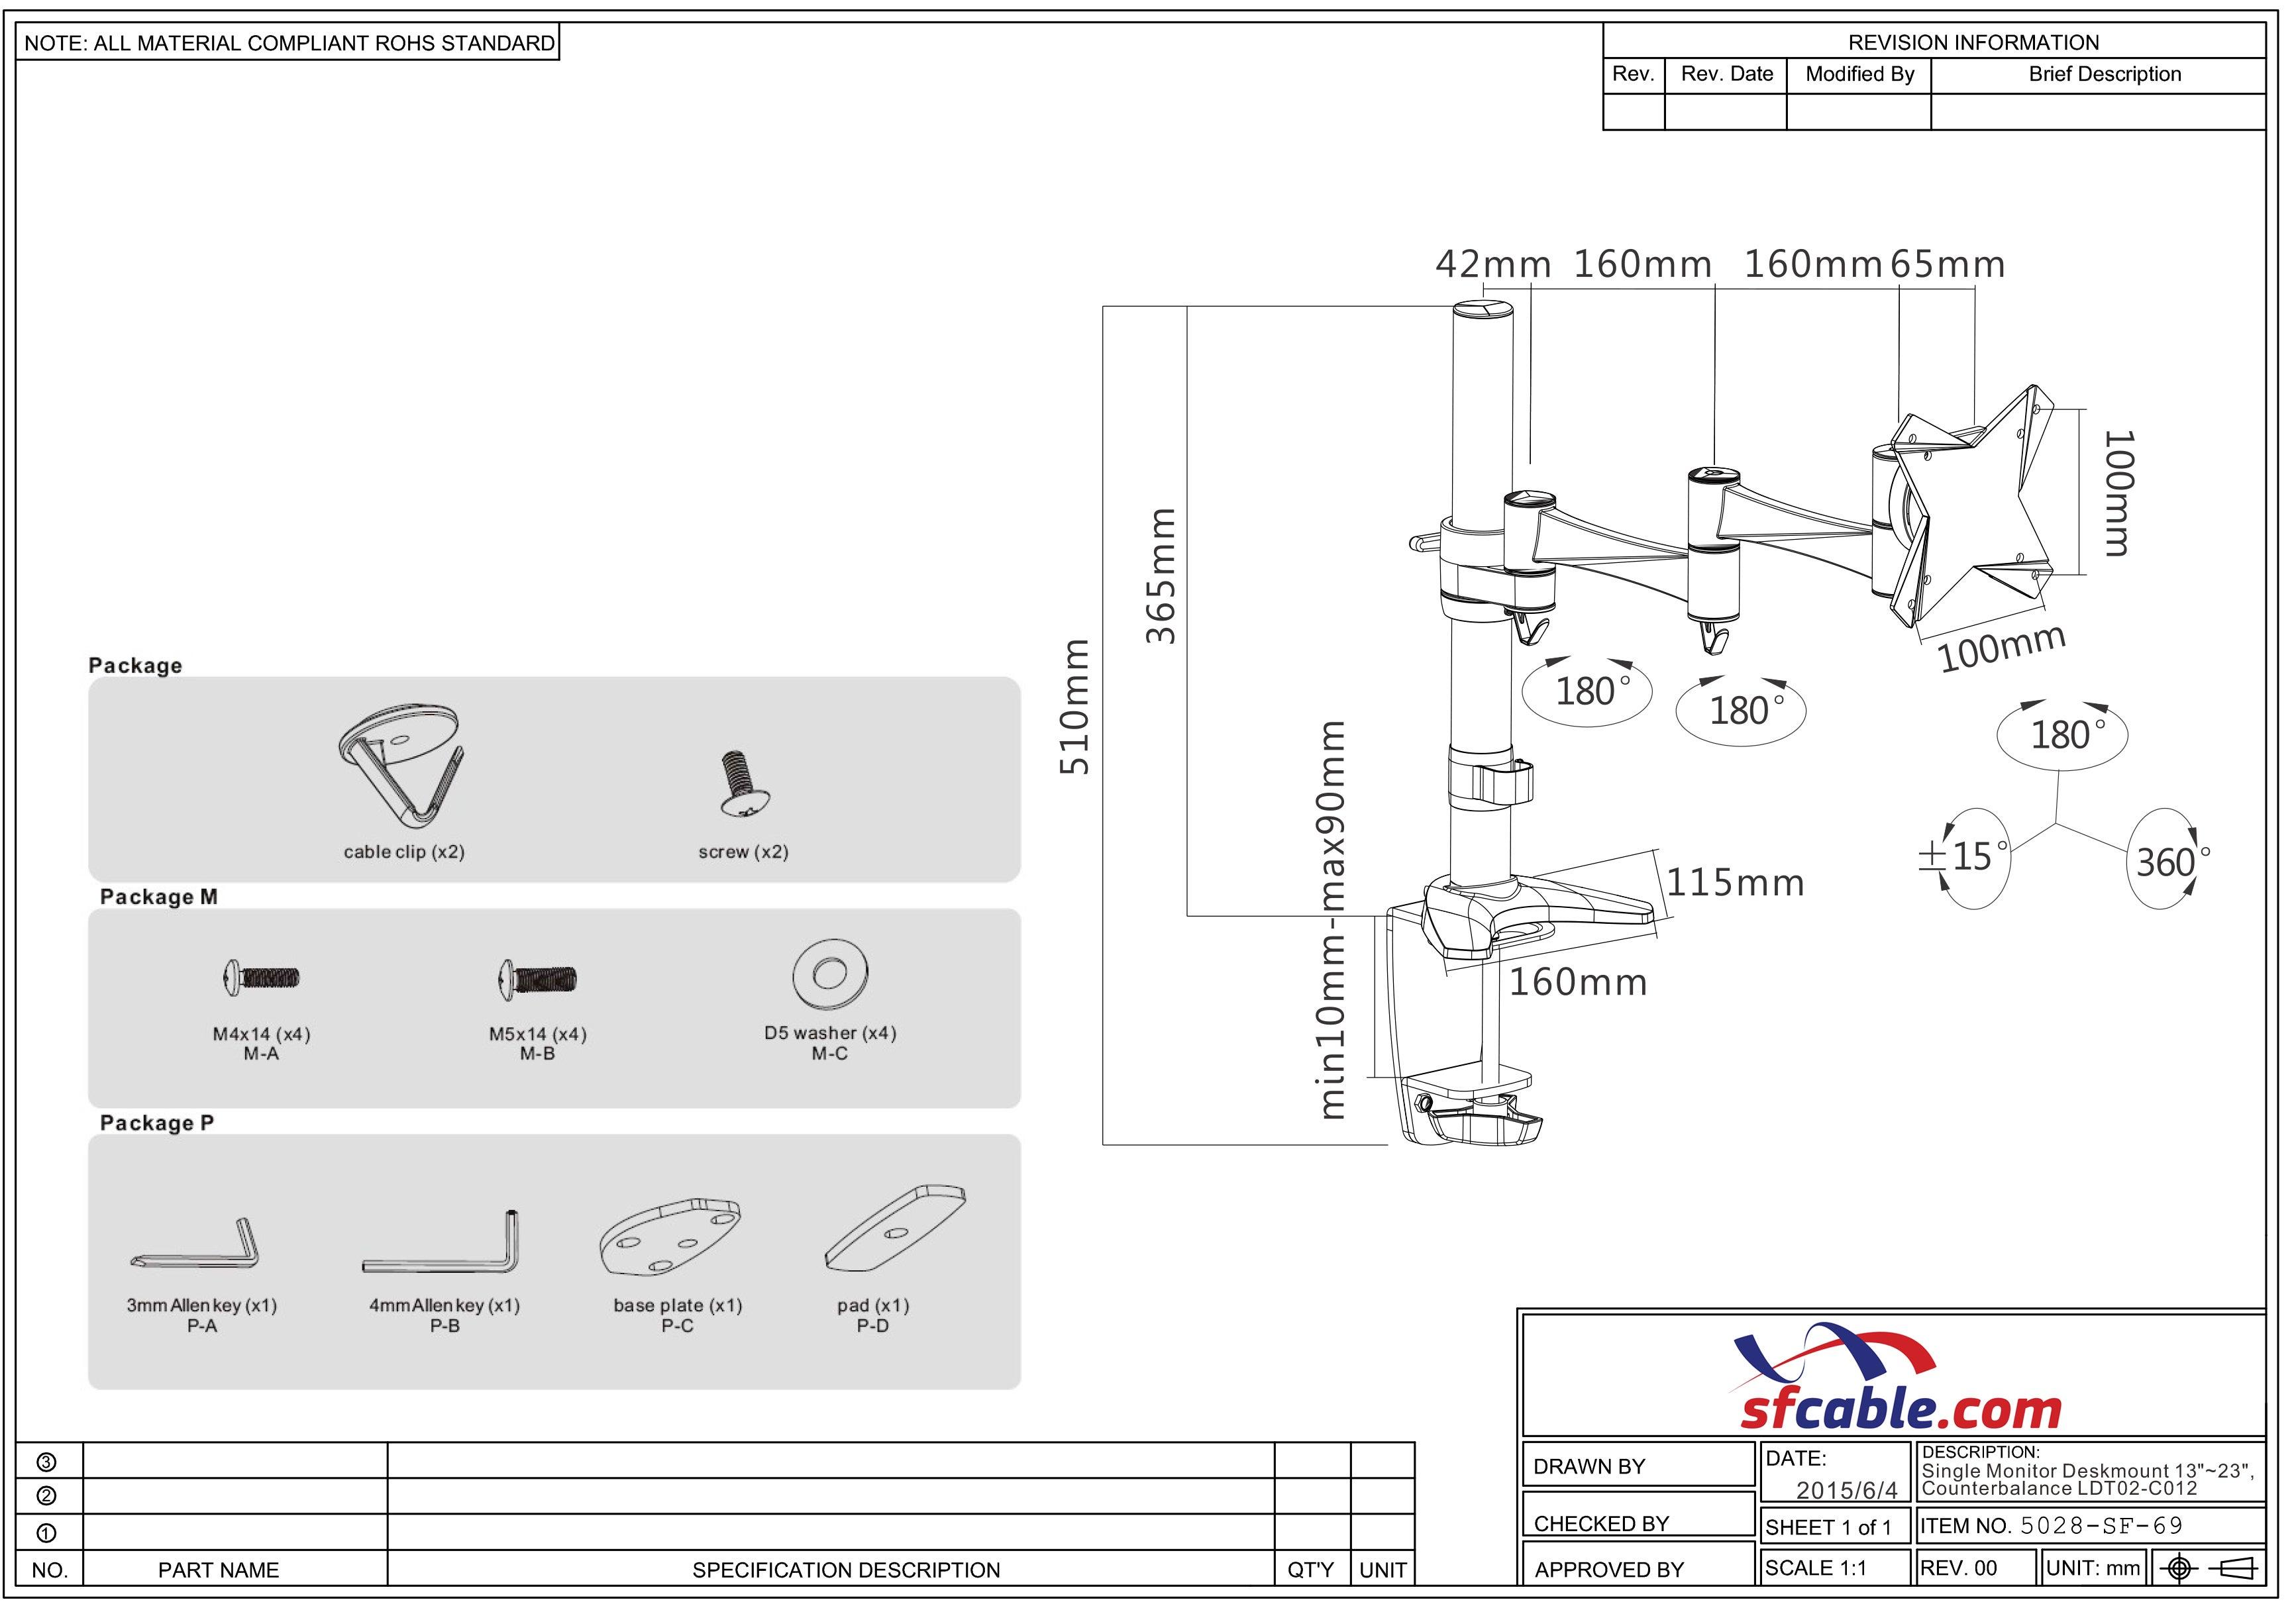 Single Monitor Deskmount 13~23